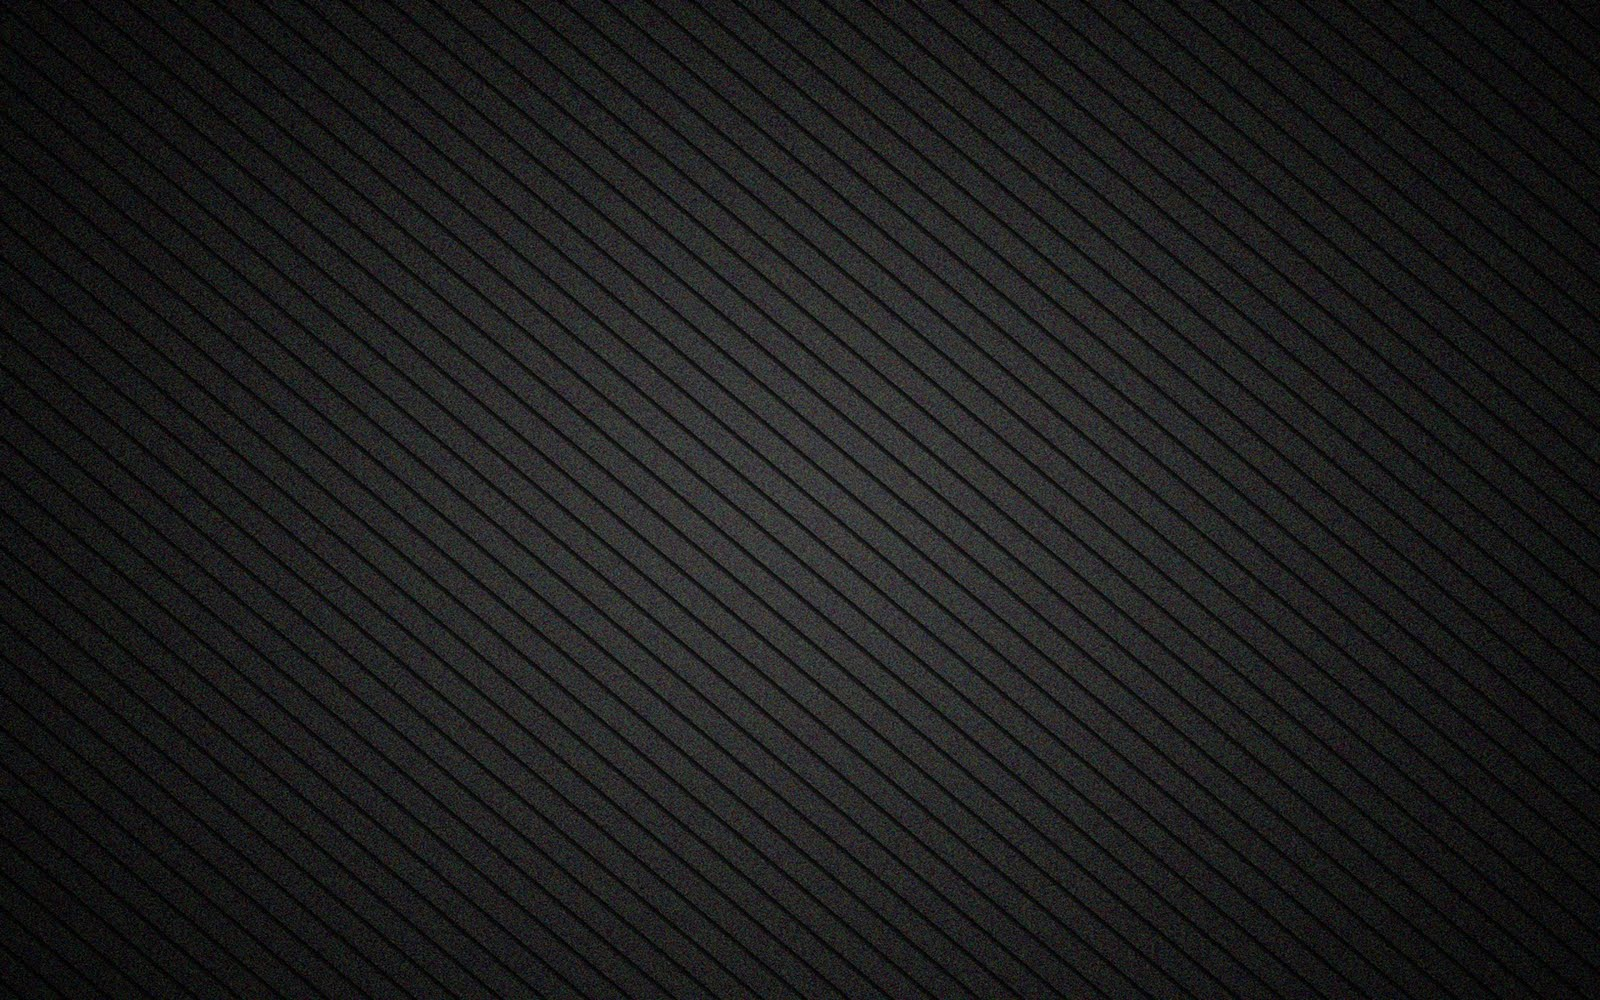 Black 3d Wallpapers: HD Wide Wallpapers: 3D Black HD Wallpapers (30